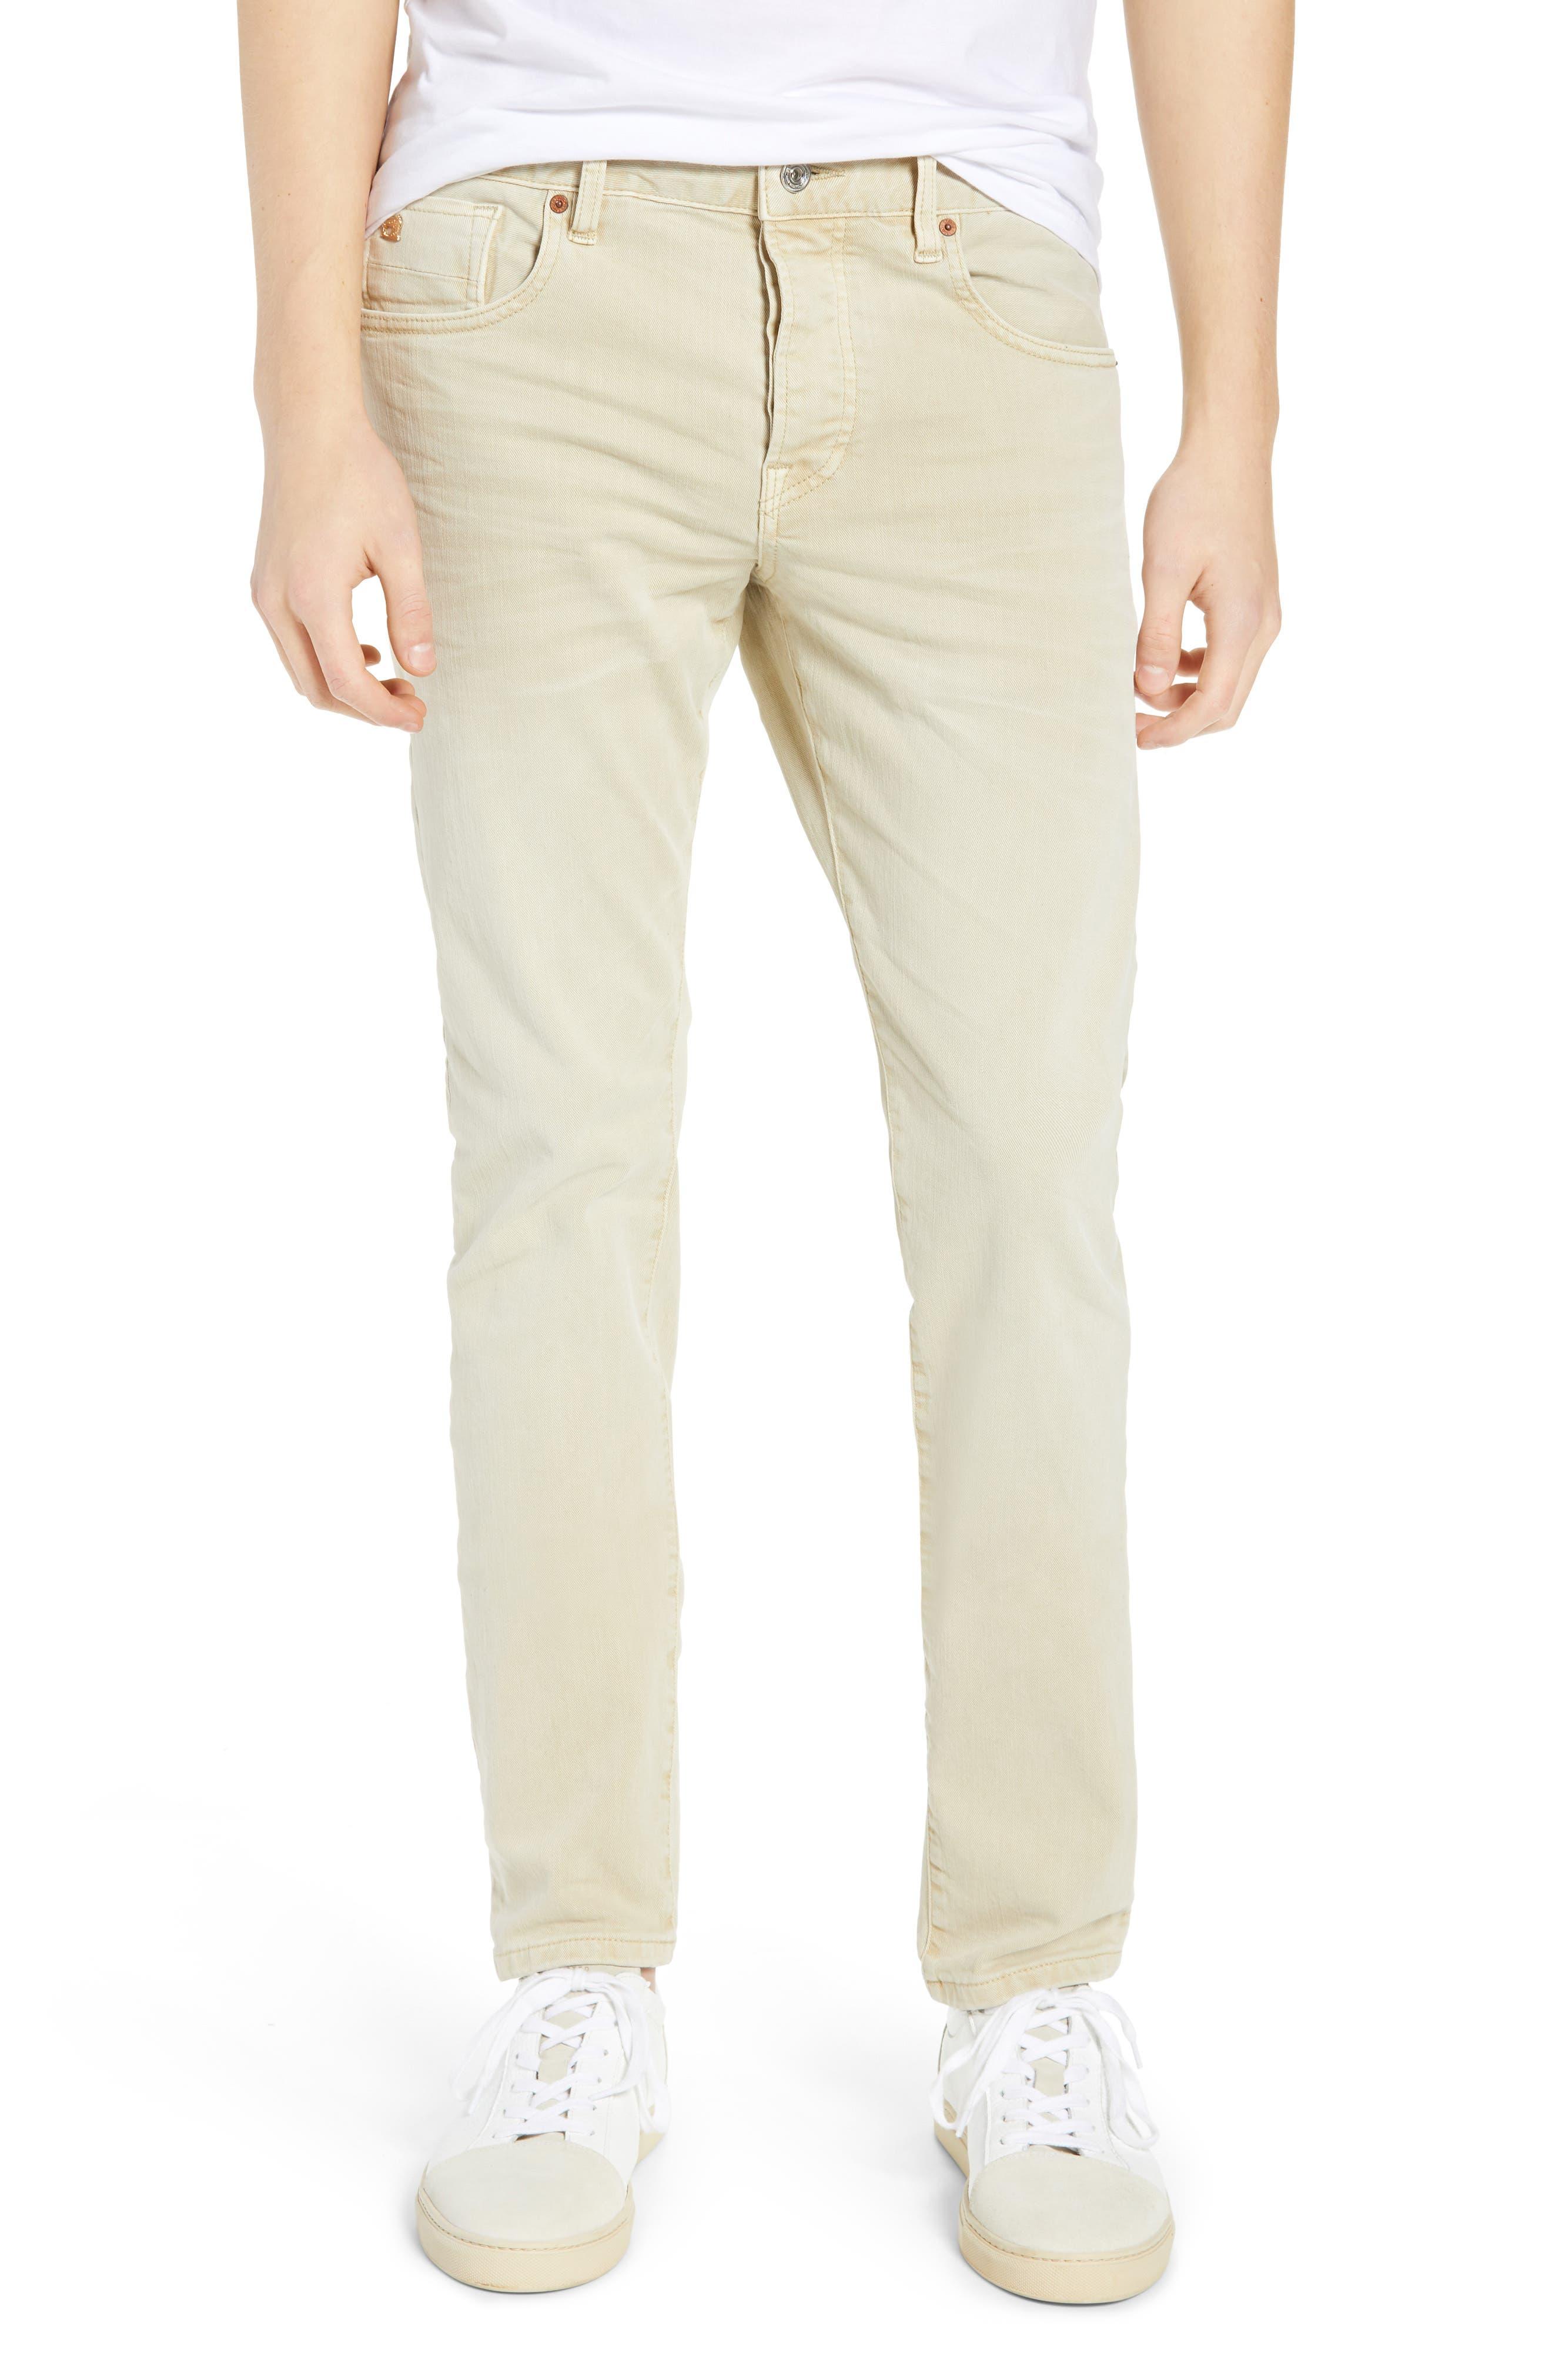 Ralston Slim Fit Pants,                             Main thumbnail 1, color,                             SAND